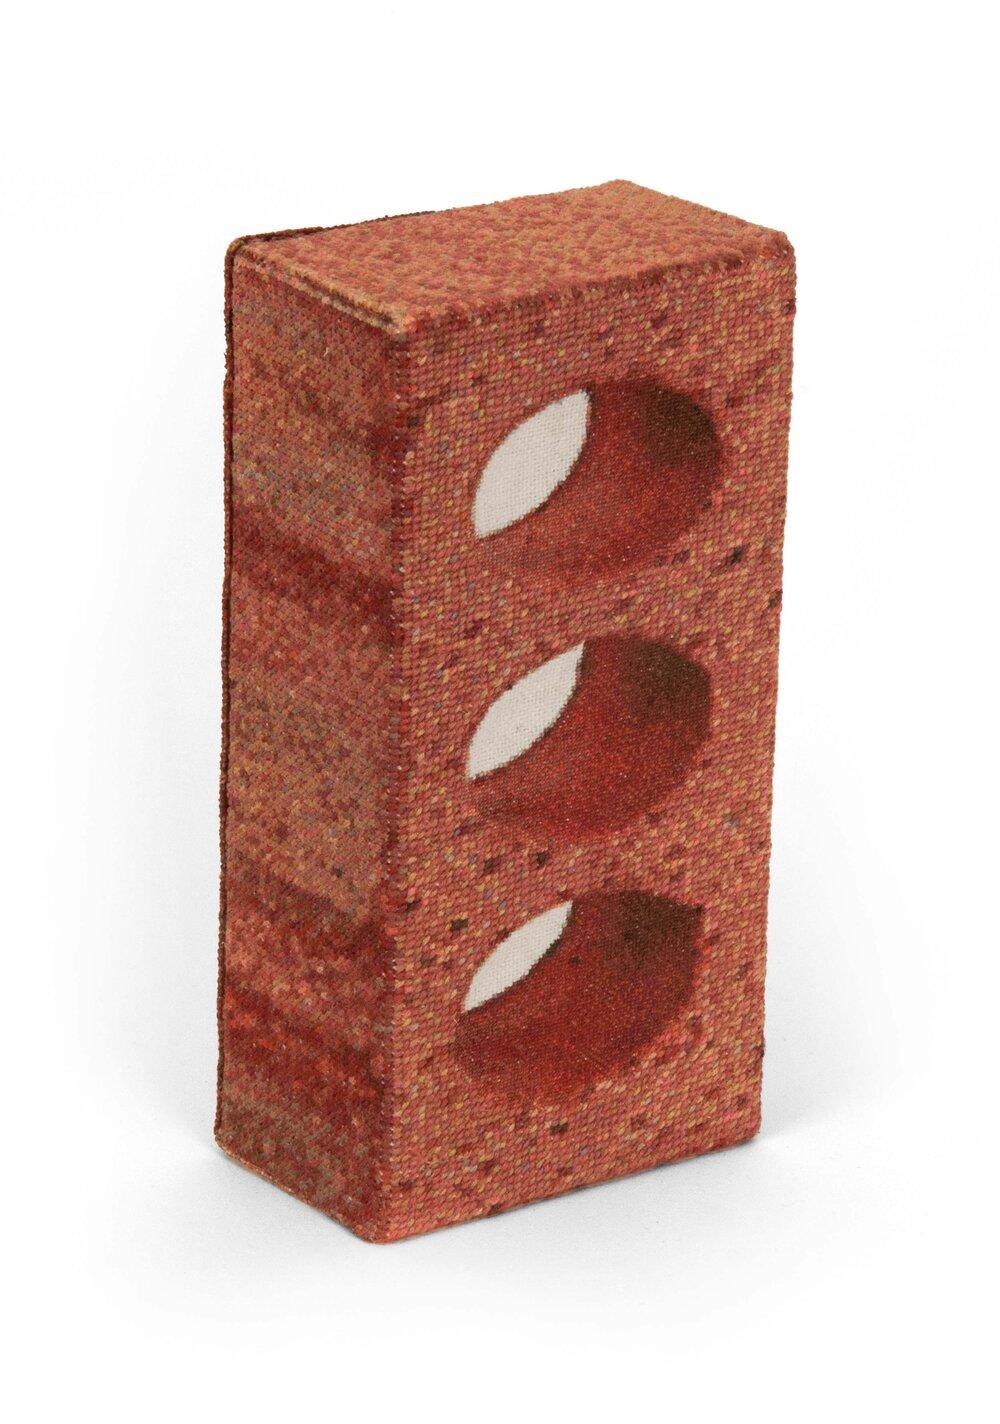 Brick 159